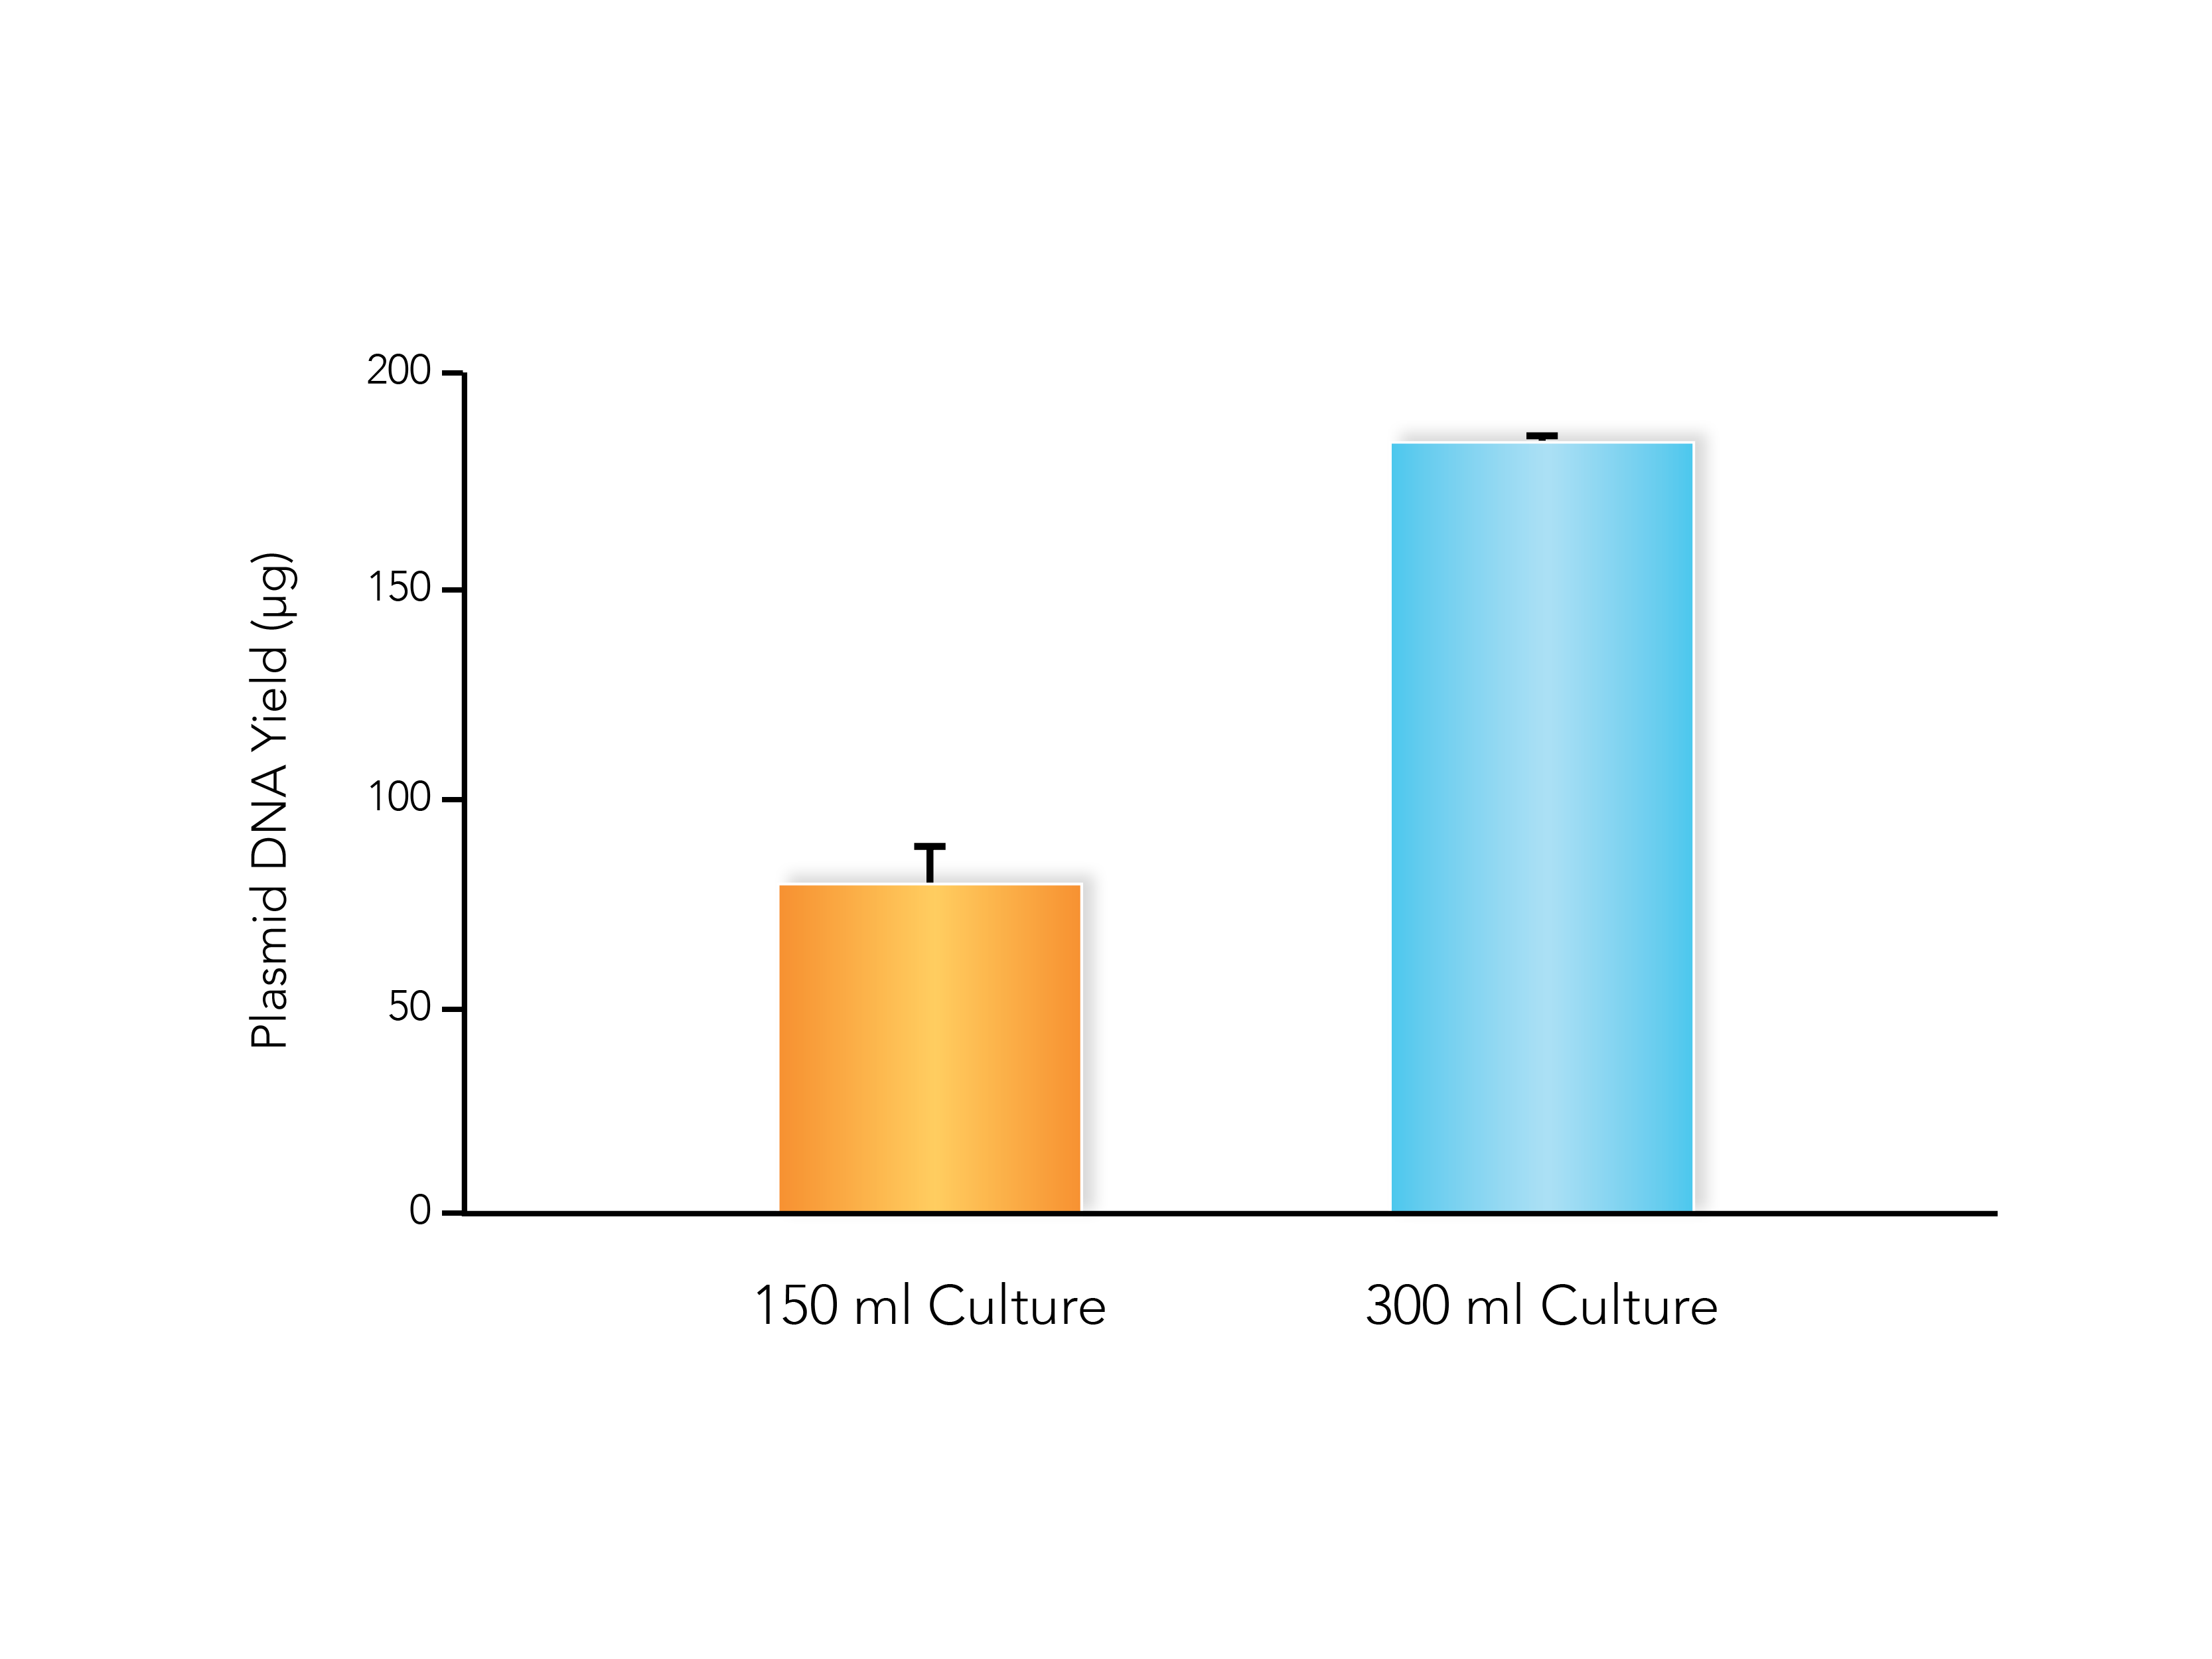 Plasmid yield graph